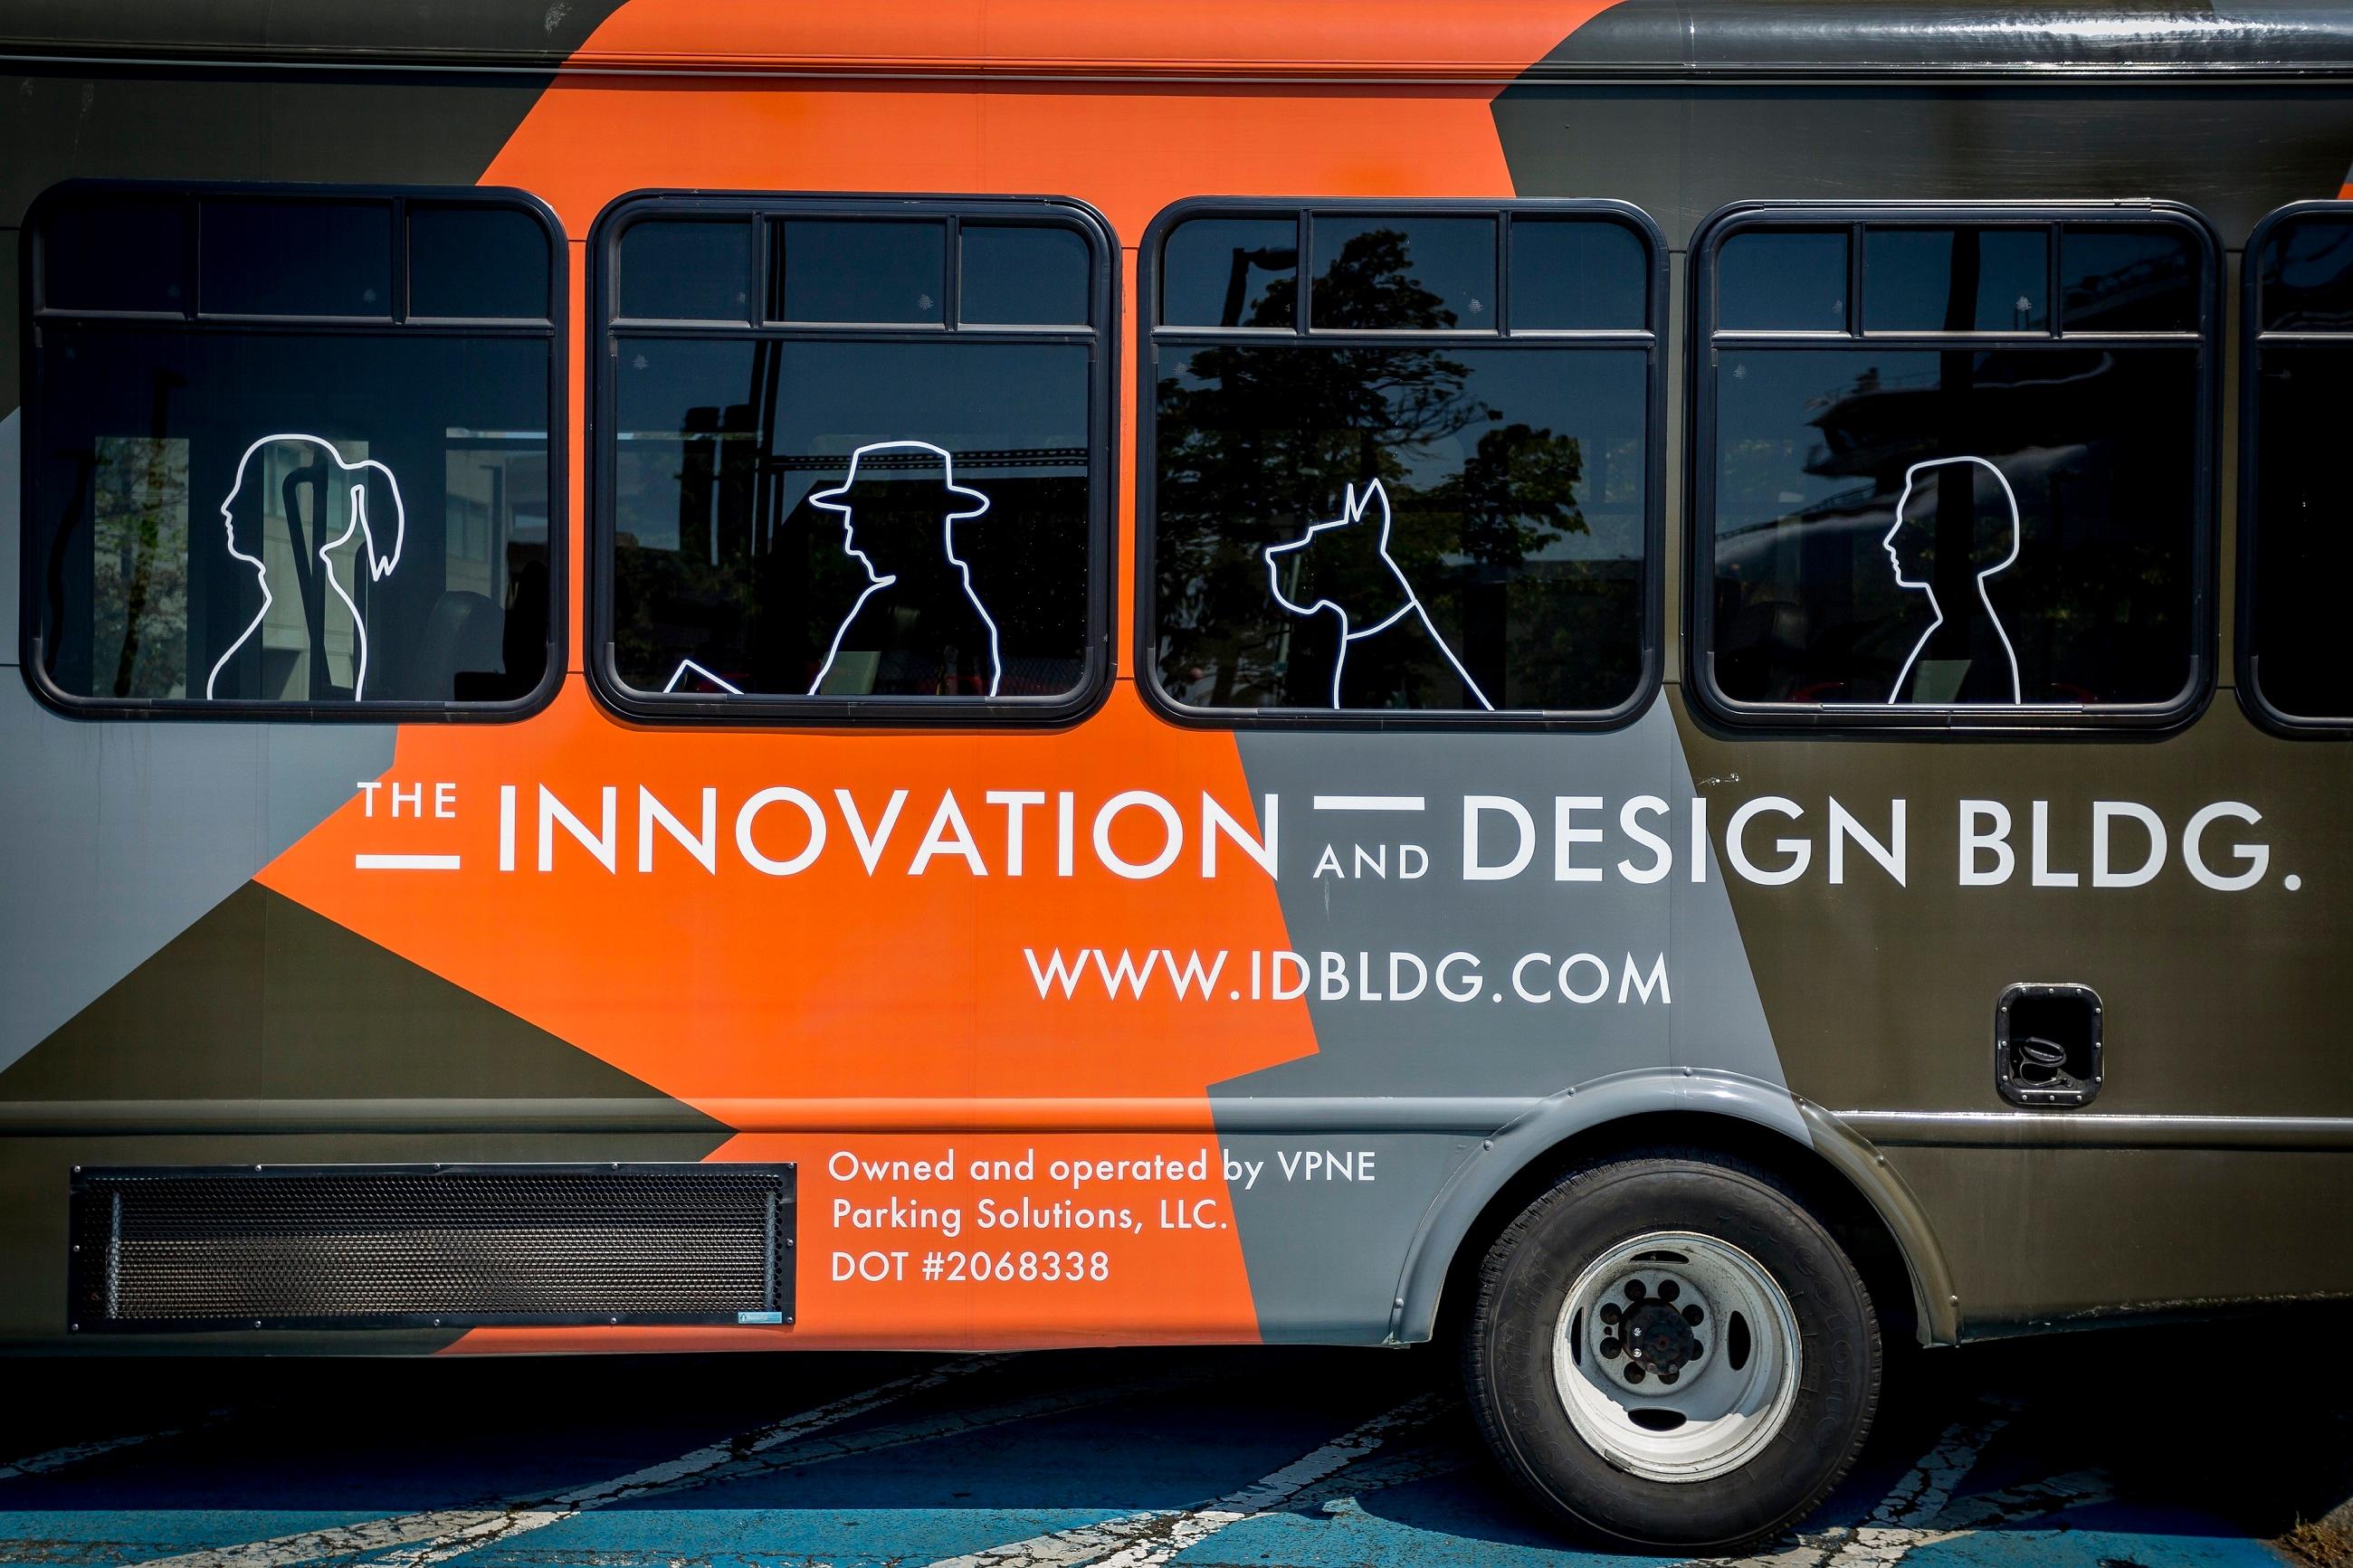 IDB Shuttle